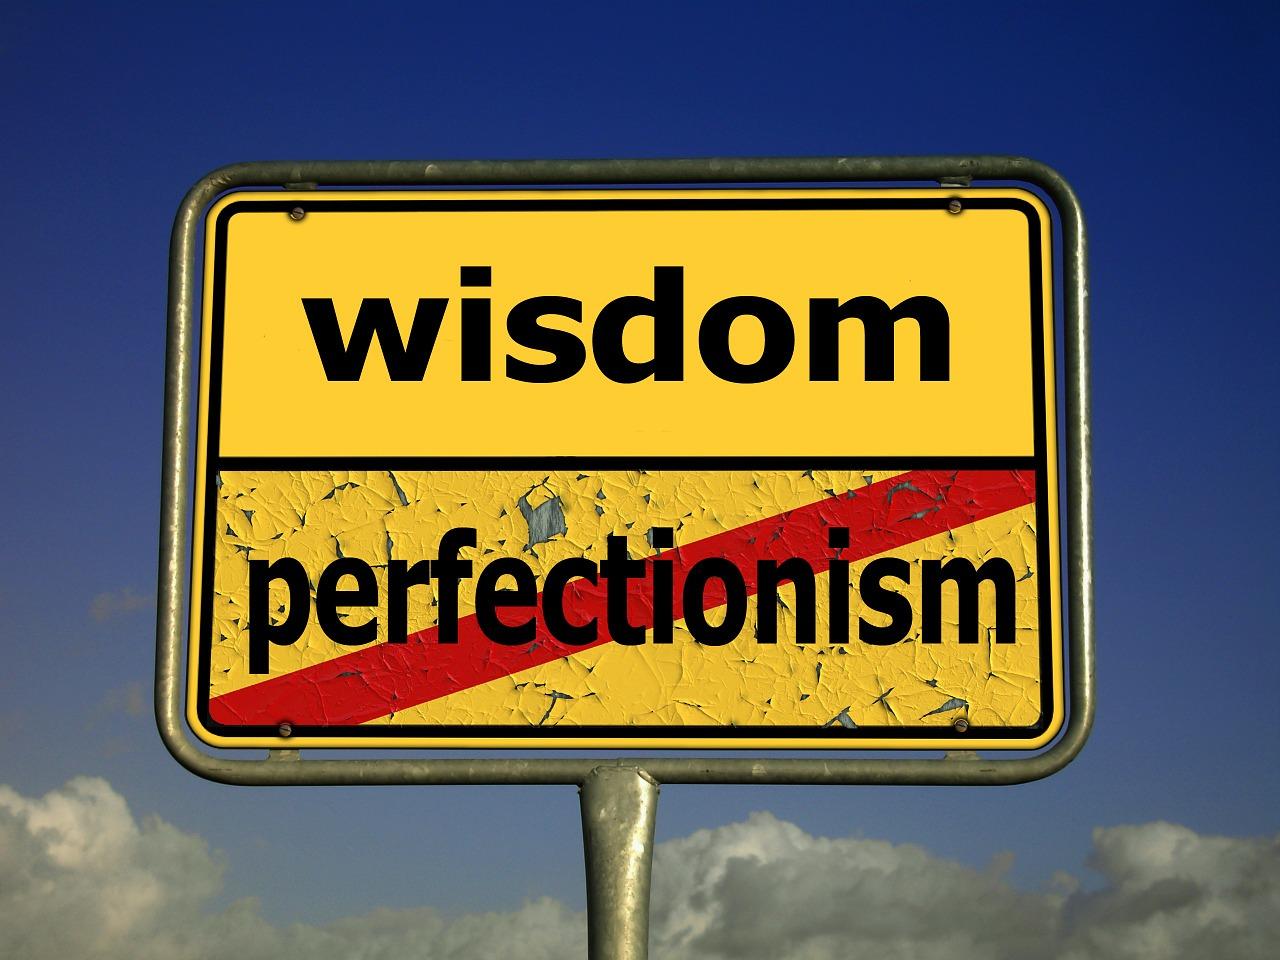 wisdom over perfection